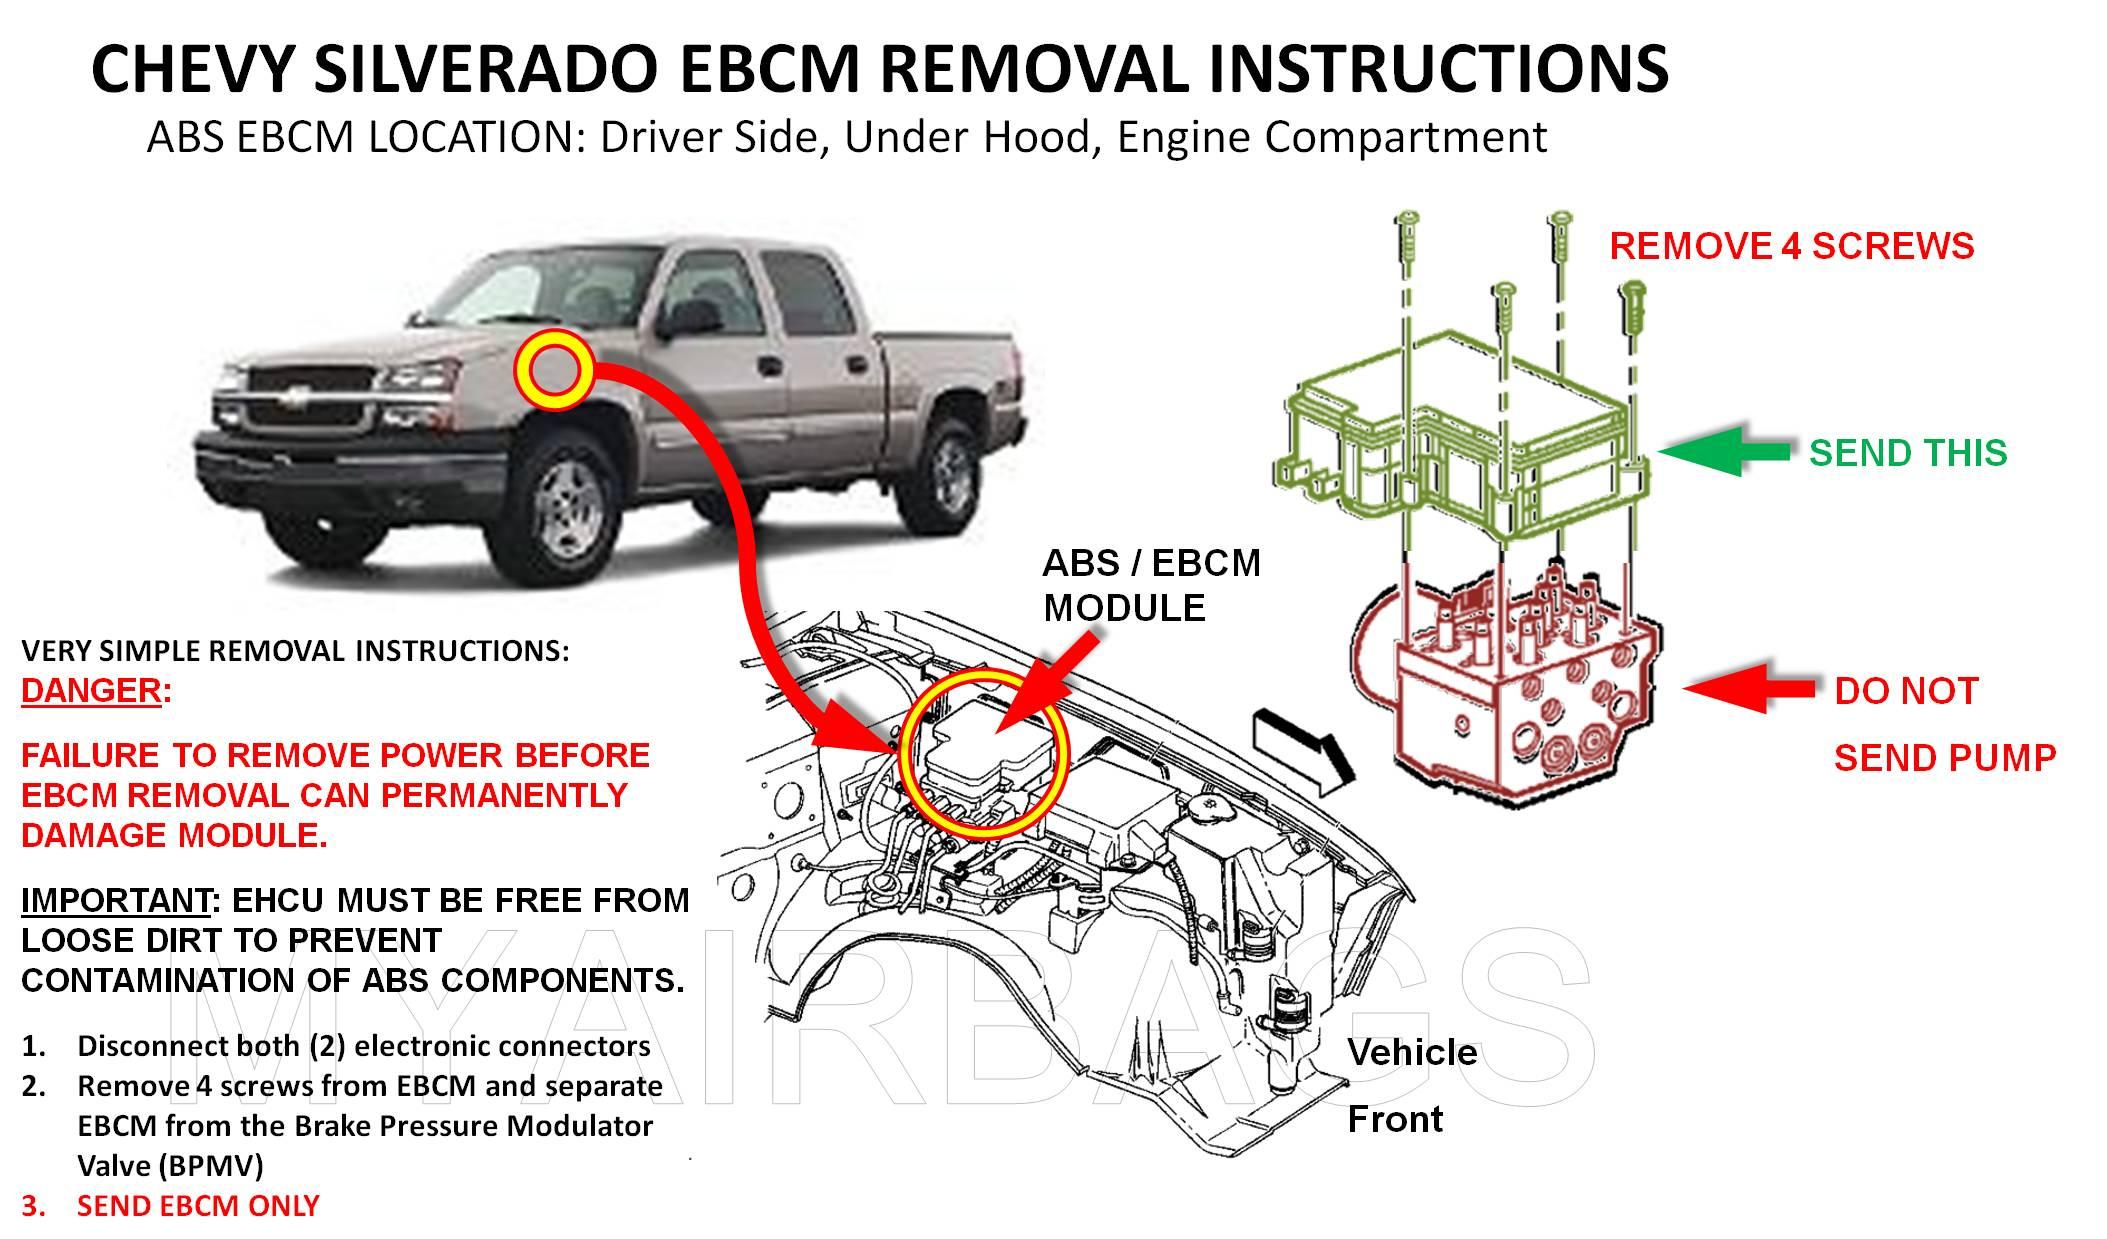 2001 mitsubishi galant headlight wiring diagram 4 way venn maker honda accord battery diagram, 2001, free engine image for user manual download